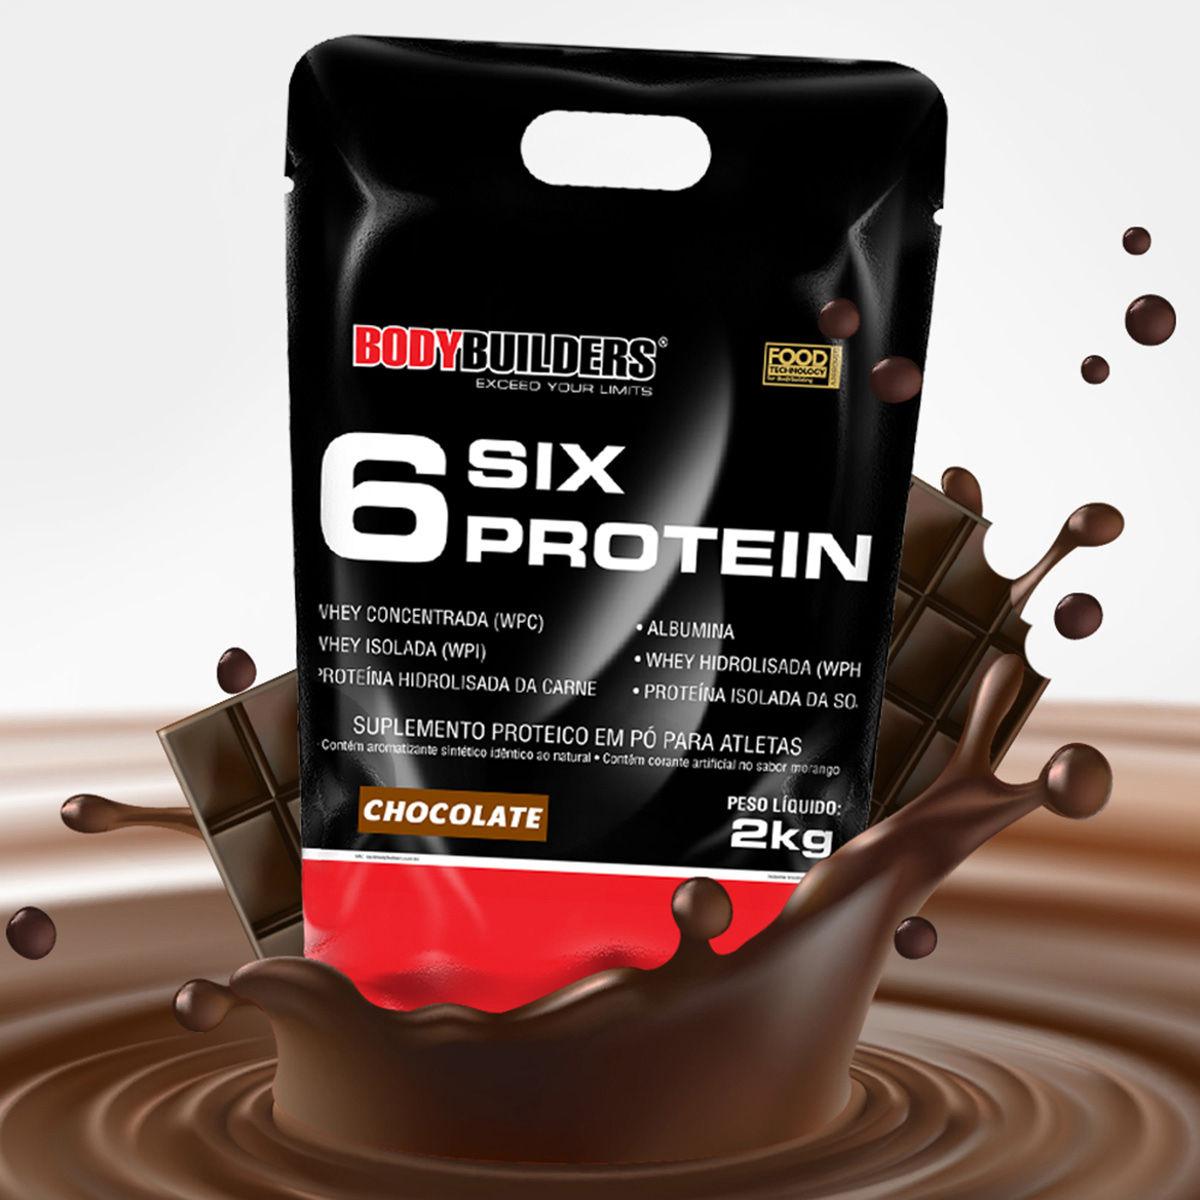 whey protein - 6 Six Protein Bodybuilders 2 Kg - R$ 59,90